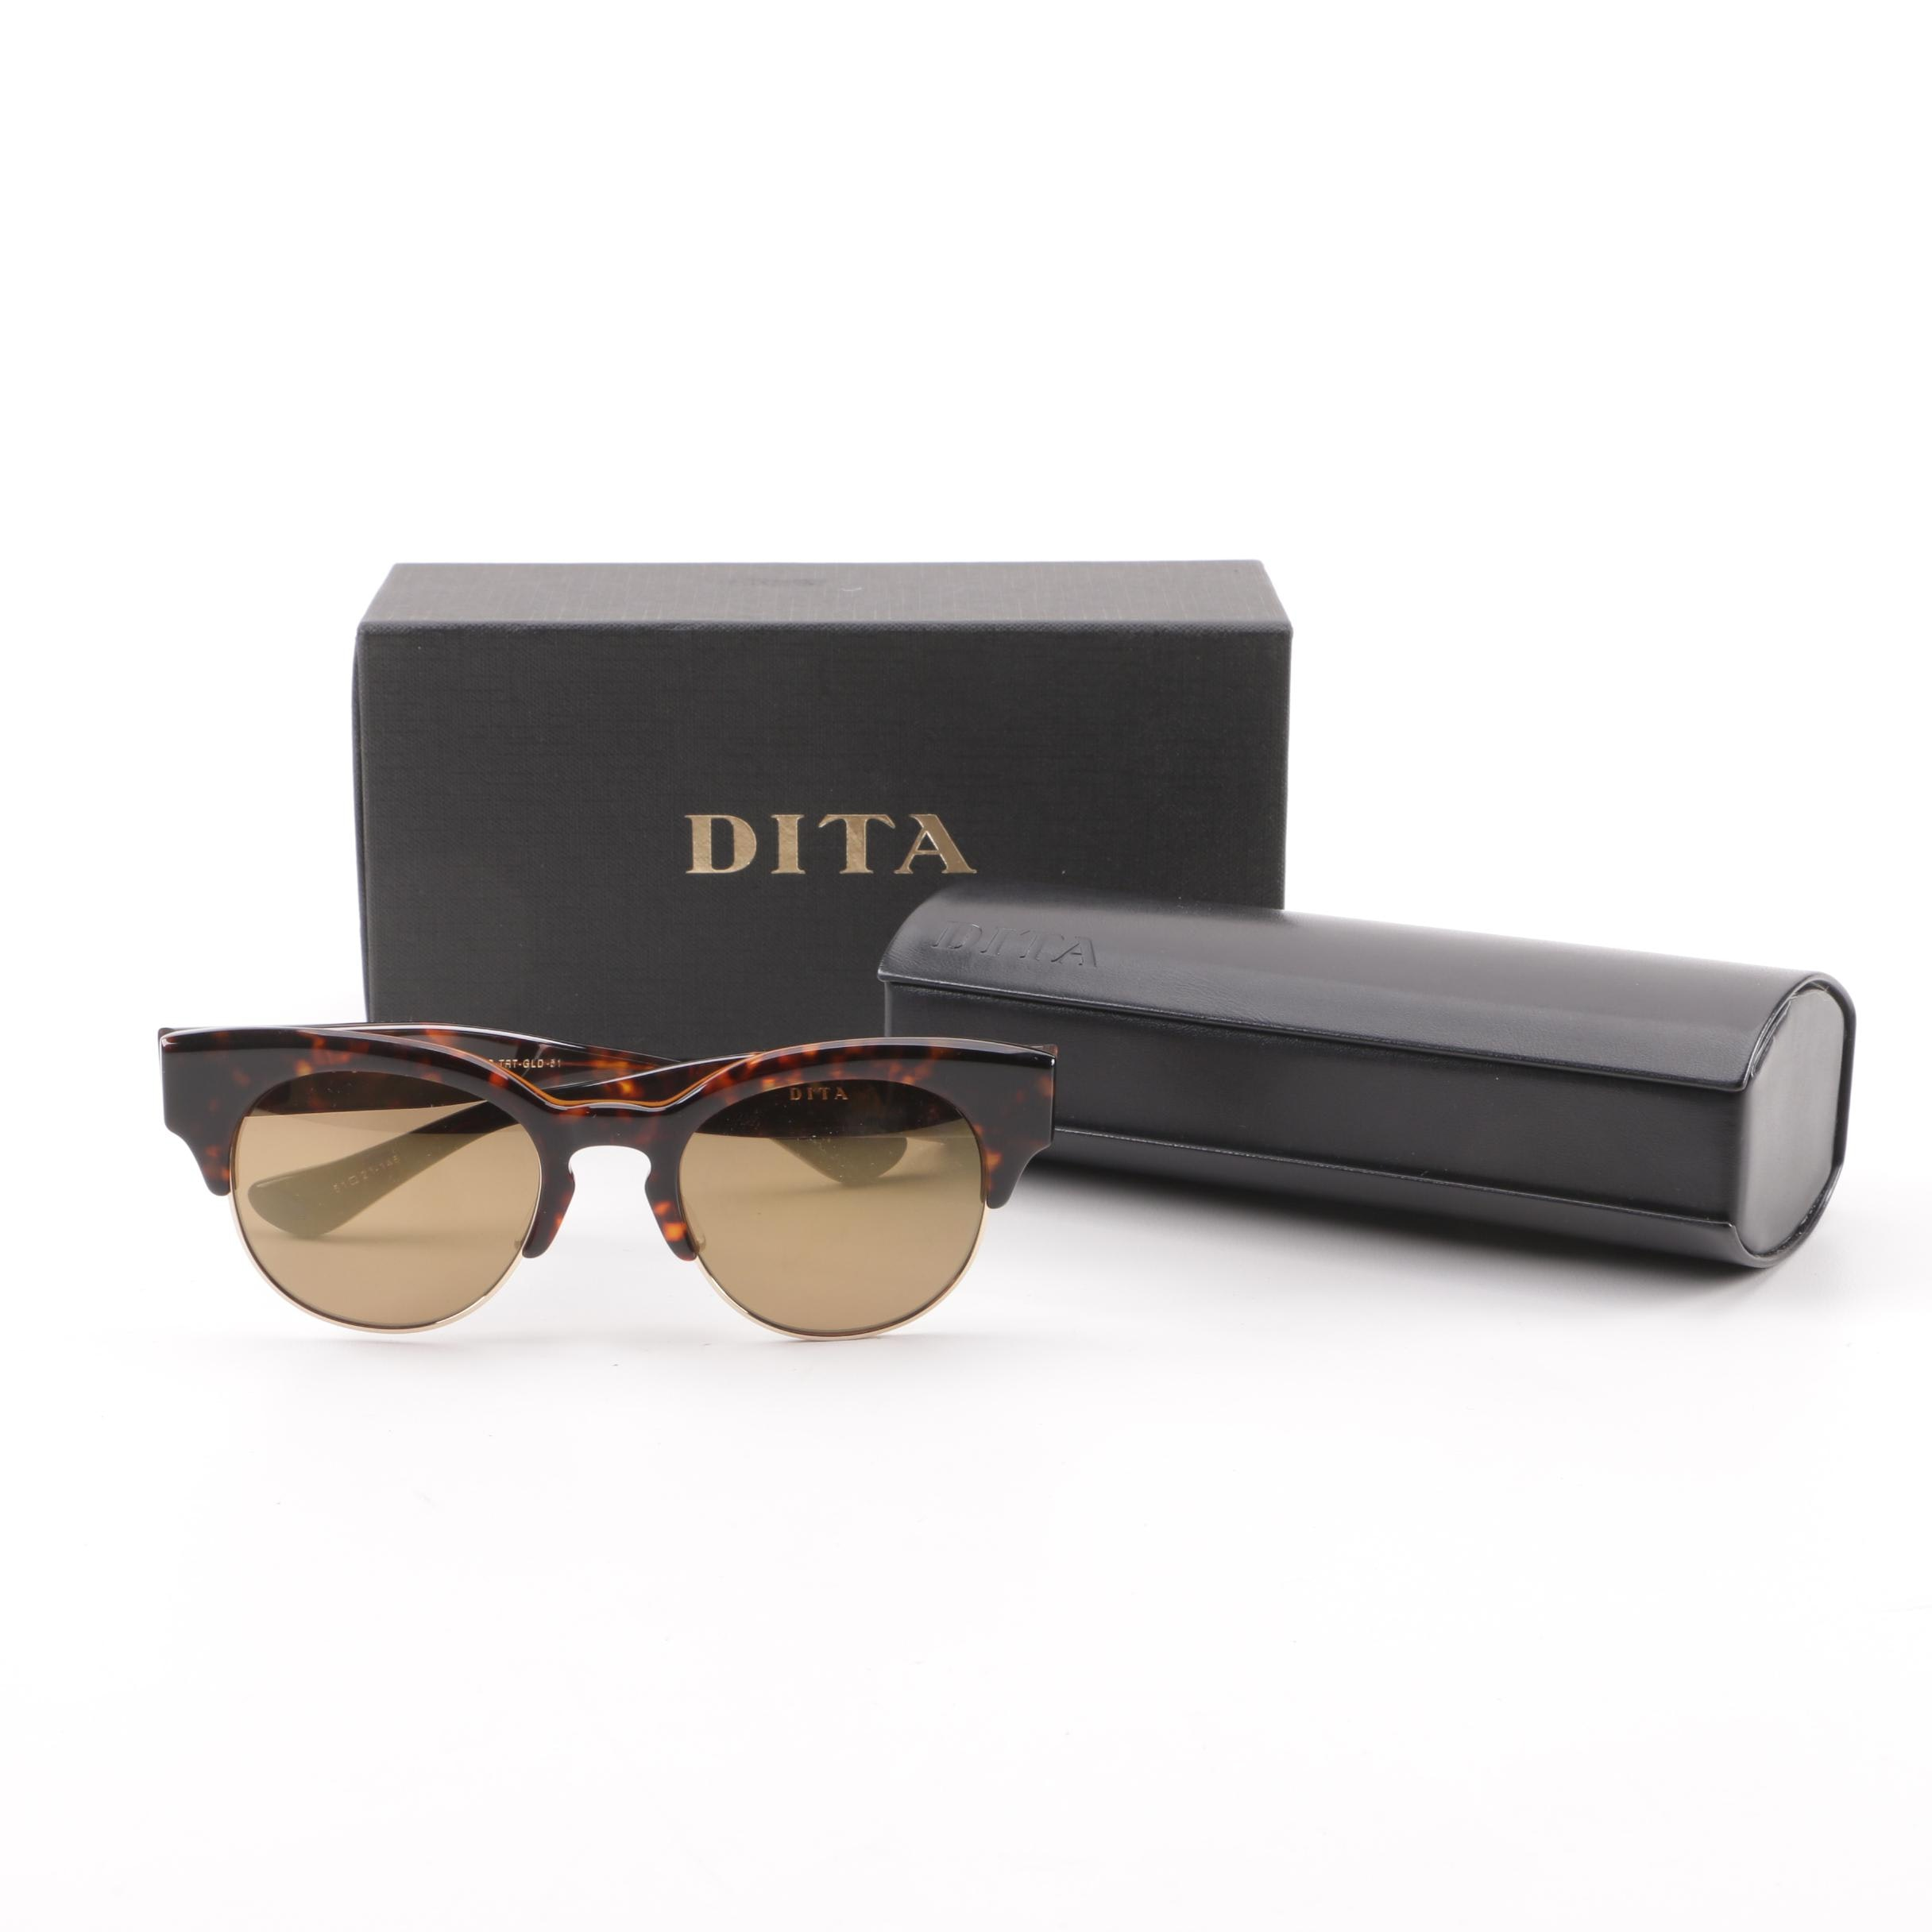 Dita Liberty 22026-B Tortoiseshell Style Browline Sunglasses with Case